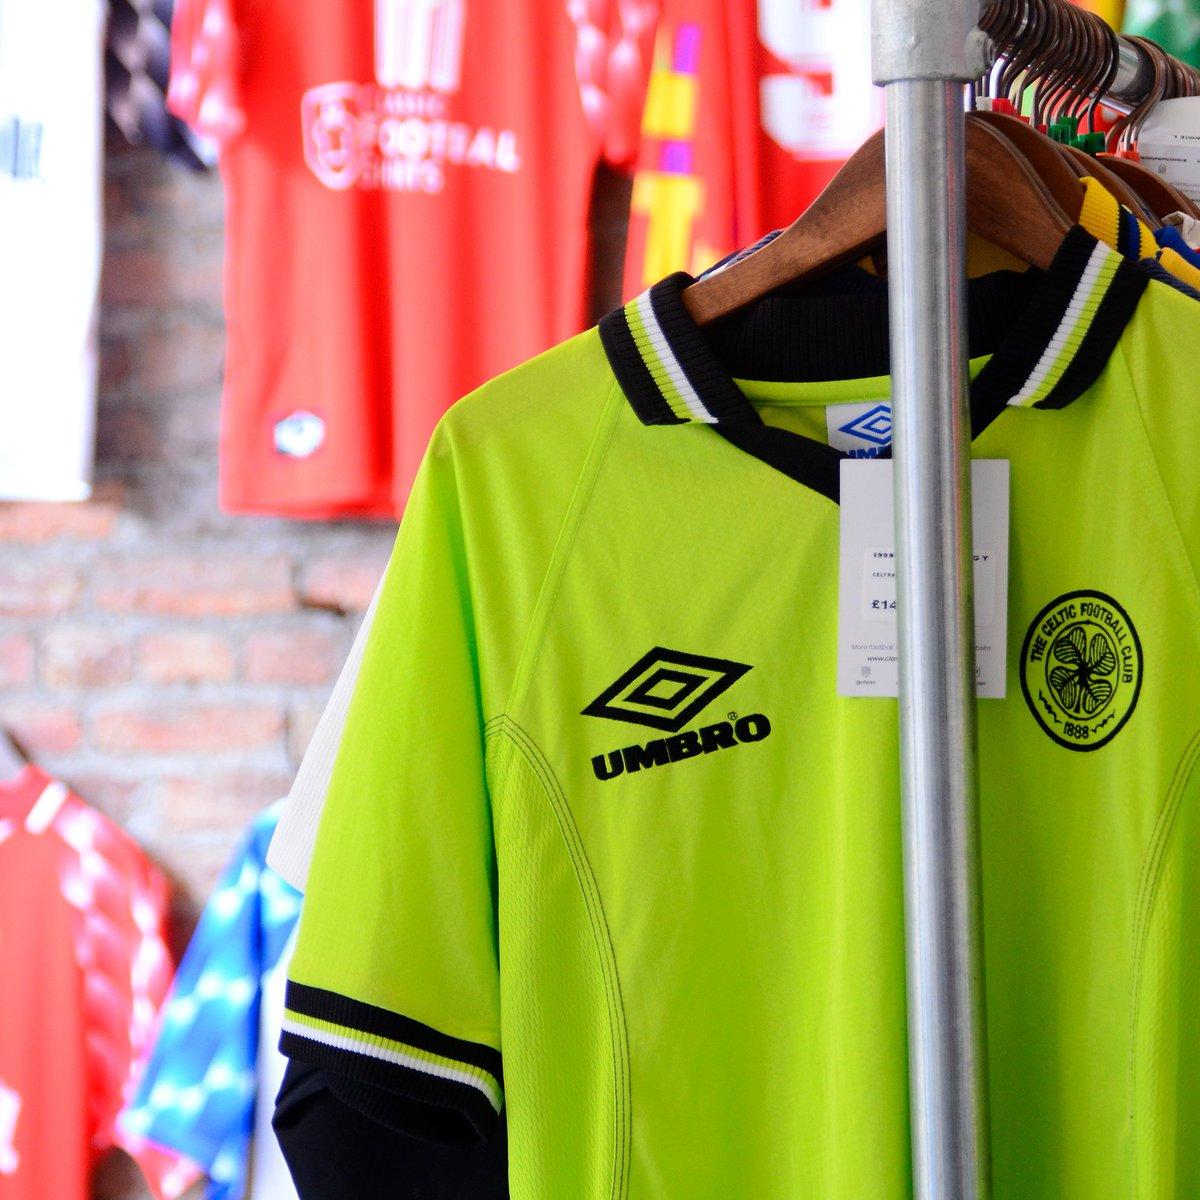 9c93552d7 Classic Football Shirts on Twitter